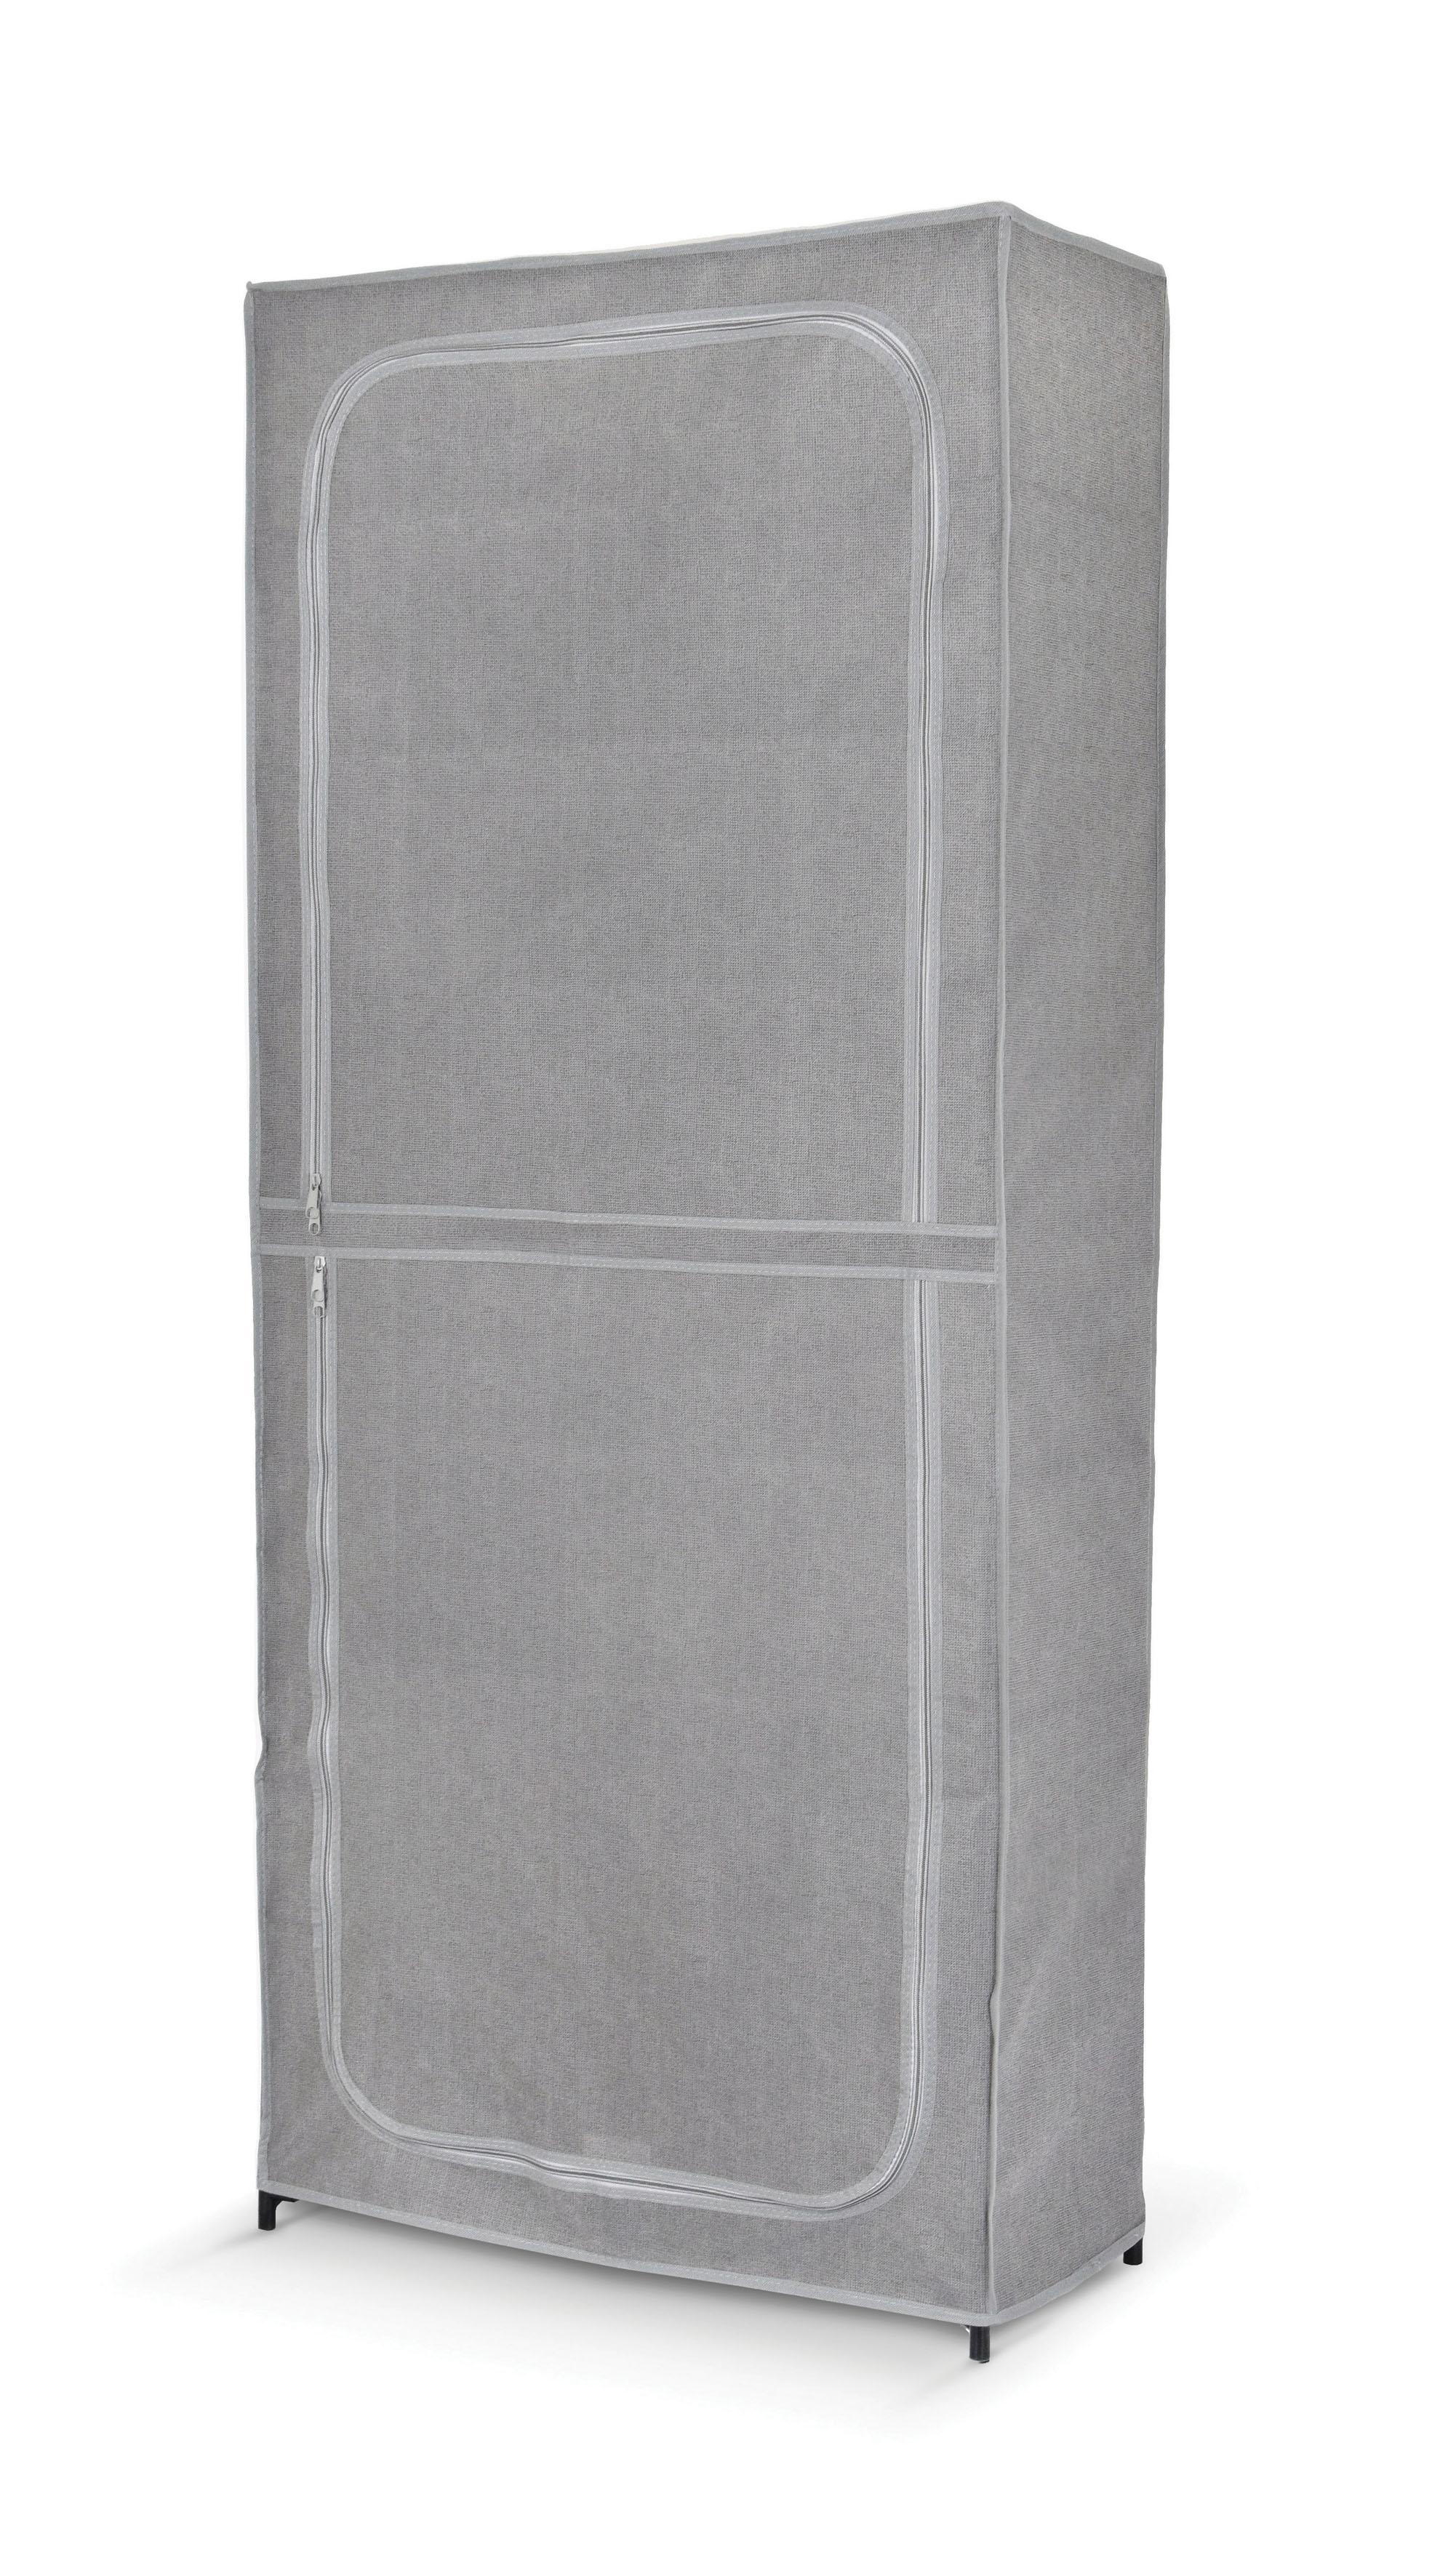 Suport textil pentru incaltaminte, 7 rafturi, Clara II Gri, l68xA30xH160 cm imagine